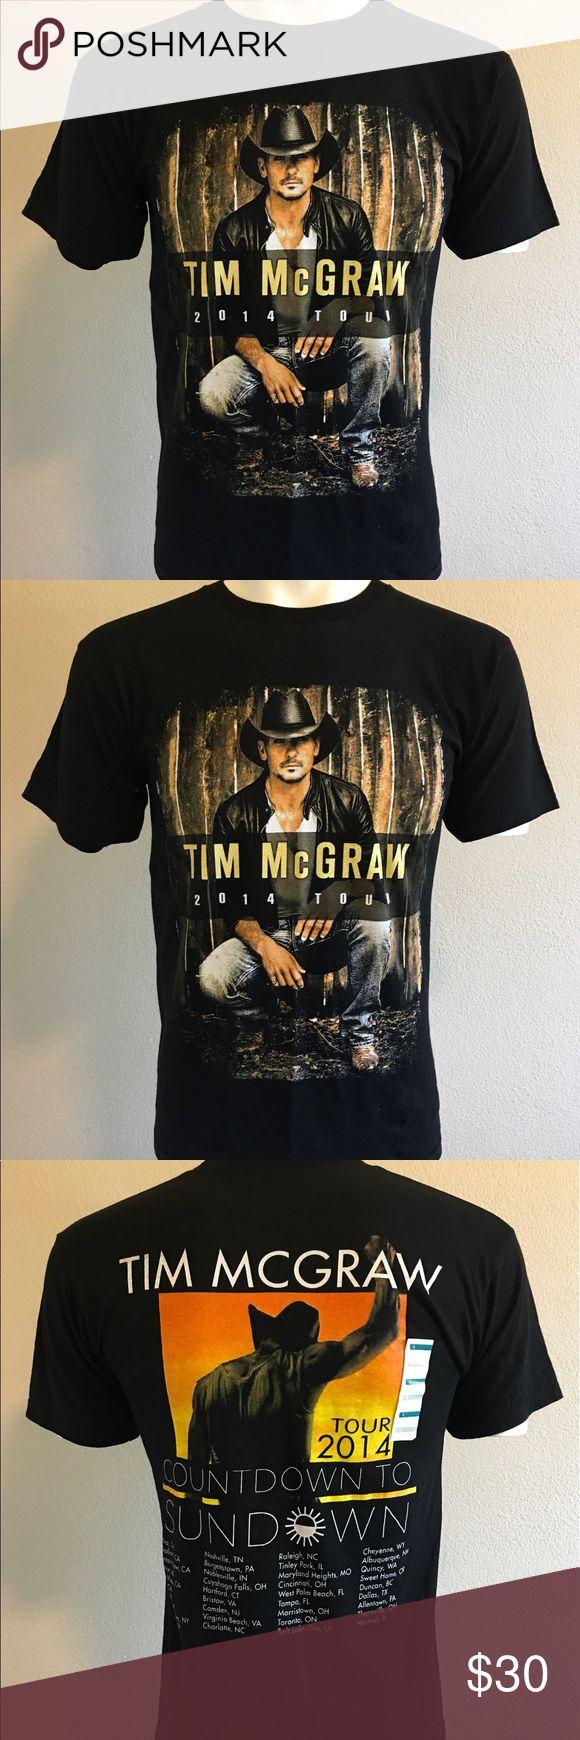 "NWOT Tim McGraw 2014 Tour Shirt Tim McGraw Tour Shirt  Short Sleeve   •armpits 18"" •length 26"" -A12- Tim McGraw Tops Tees - Short Sleeve"